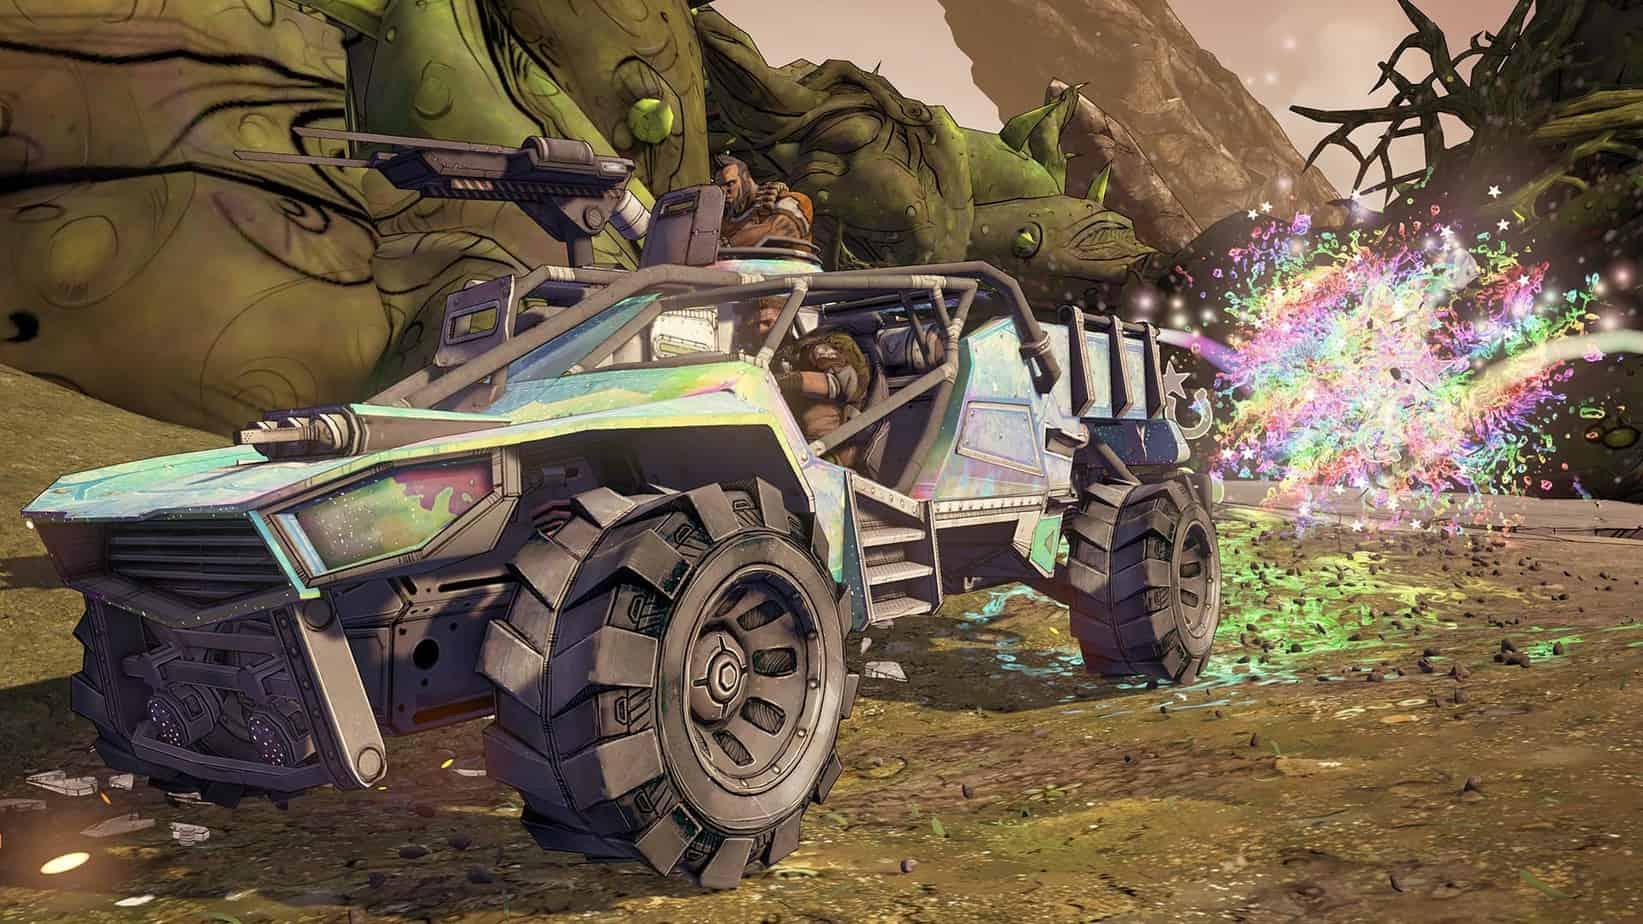 Borderlands 2 Commander Lilith & The Fight For Sanctuary транспорт для передвижения